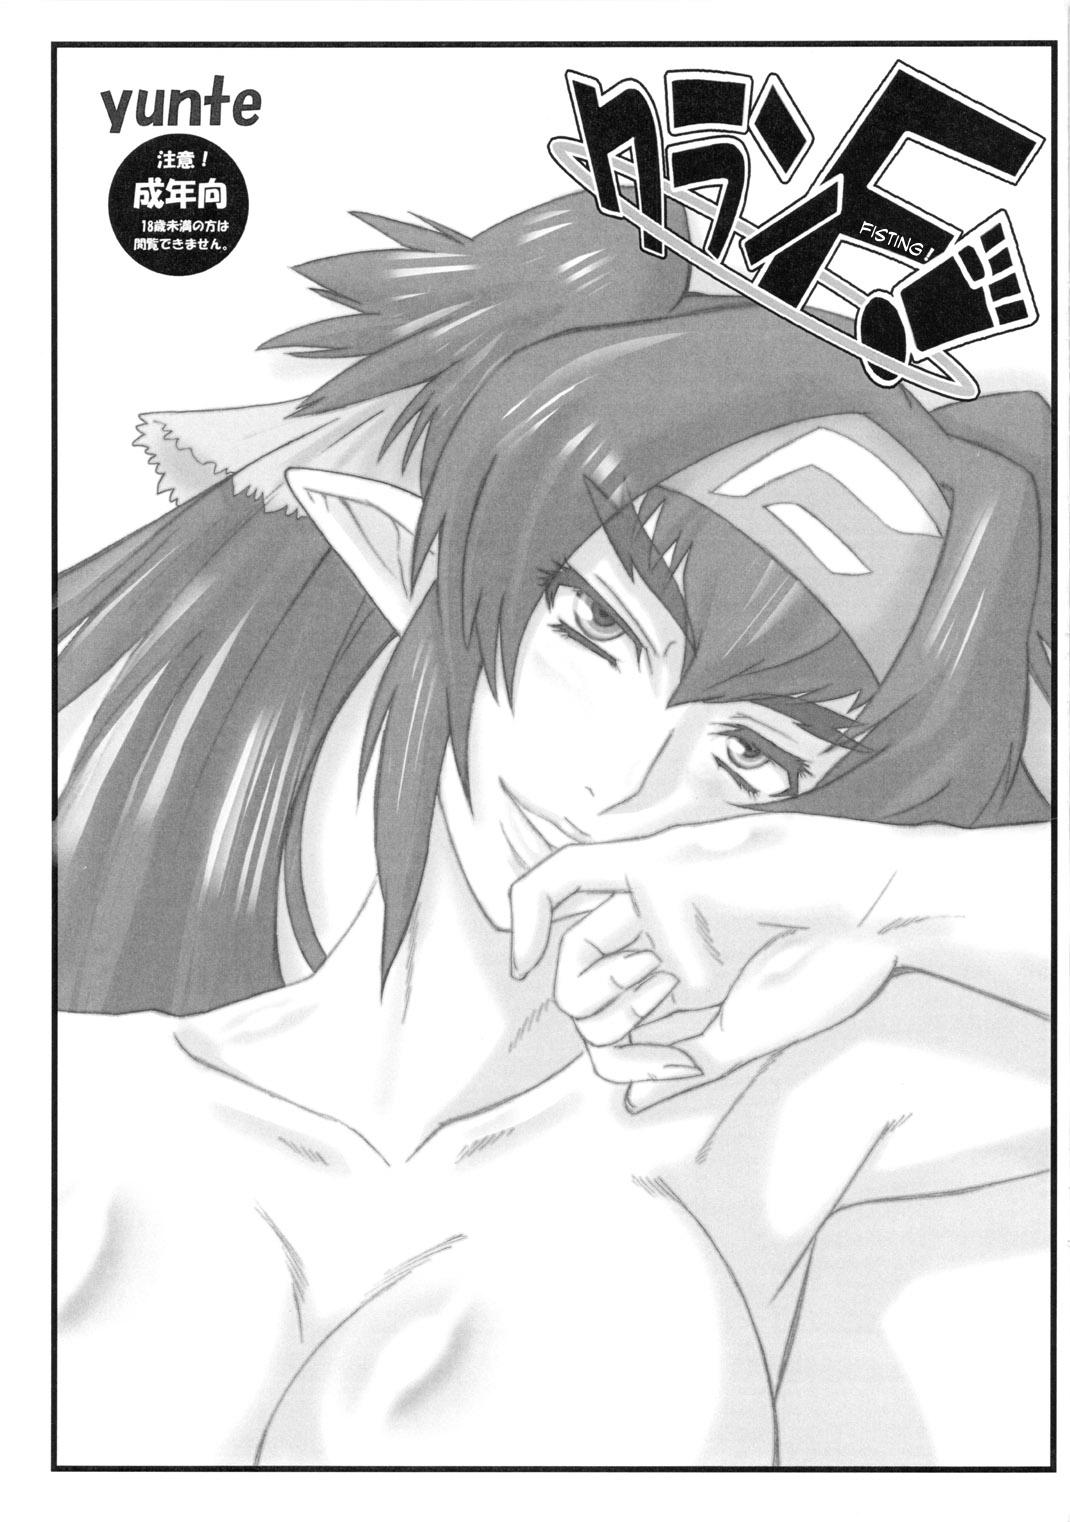 kuranF 01 sexy gay cam